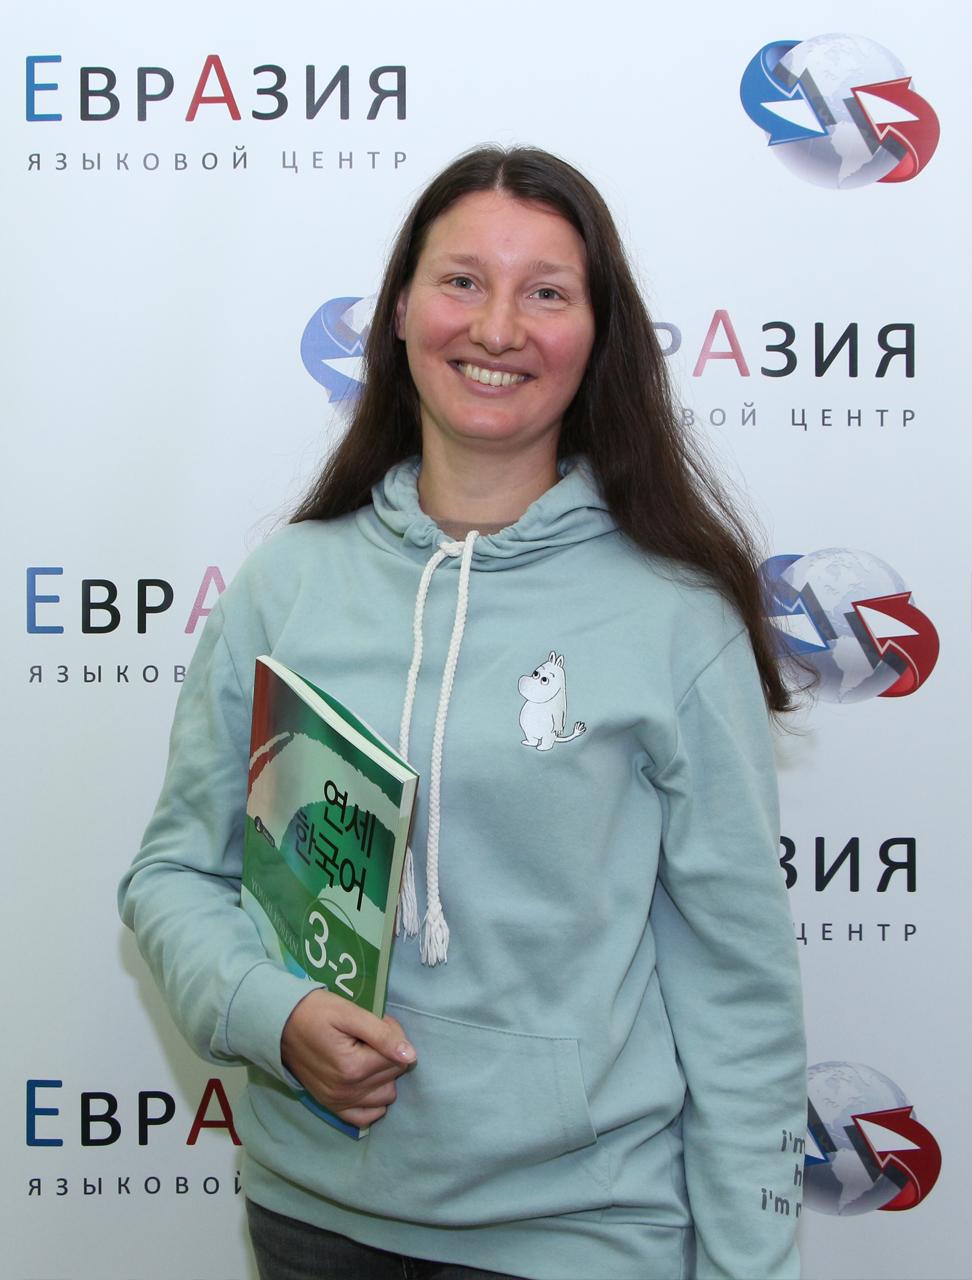 преподаватель корейского языка - Анастасия Александровна